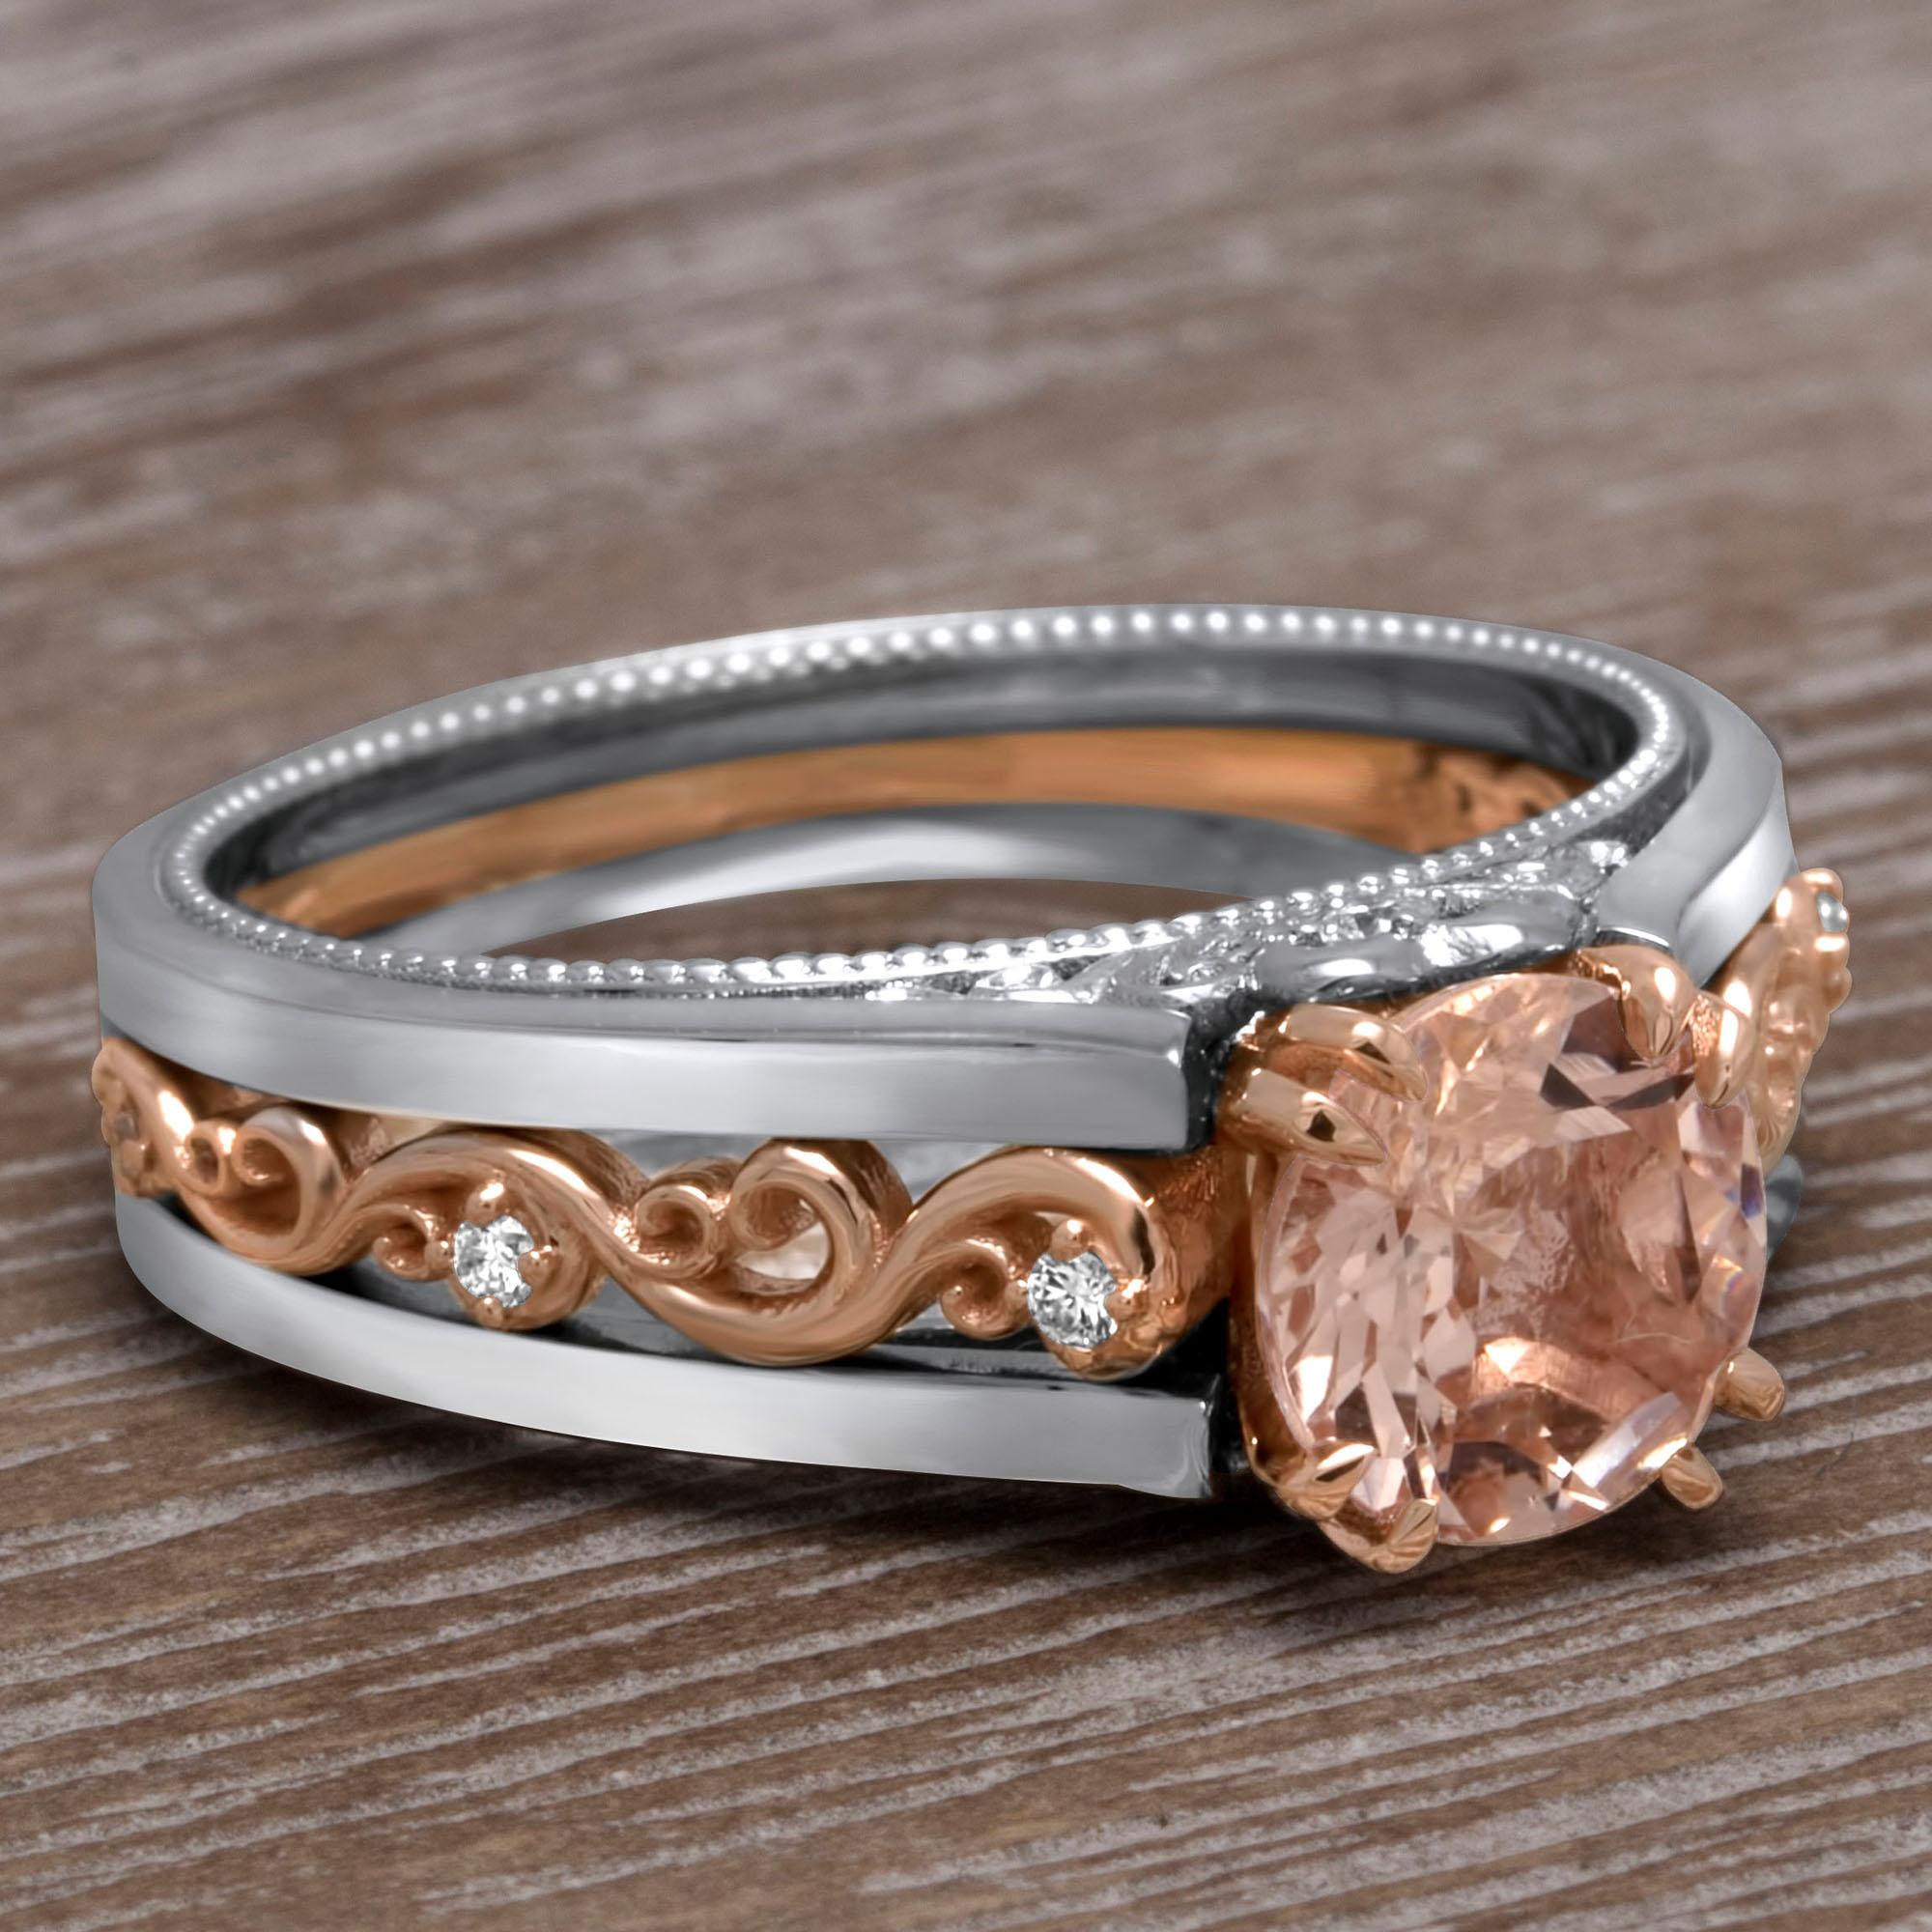 Antique Morganite Engagement Ring Vintage Morganite Ring Rose Gold and White Gold Ring Two Tone Gold Filigree Band